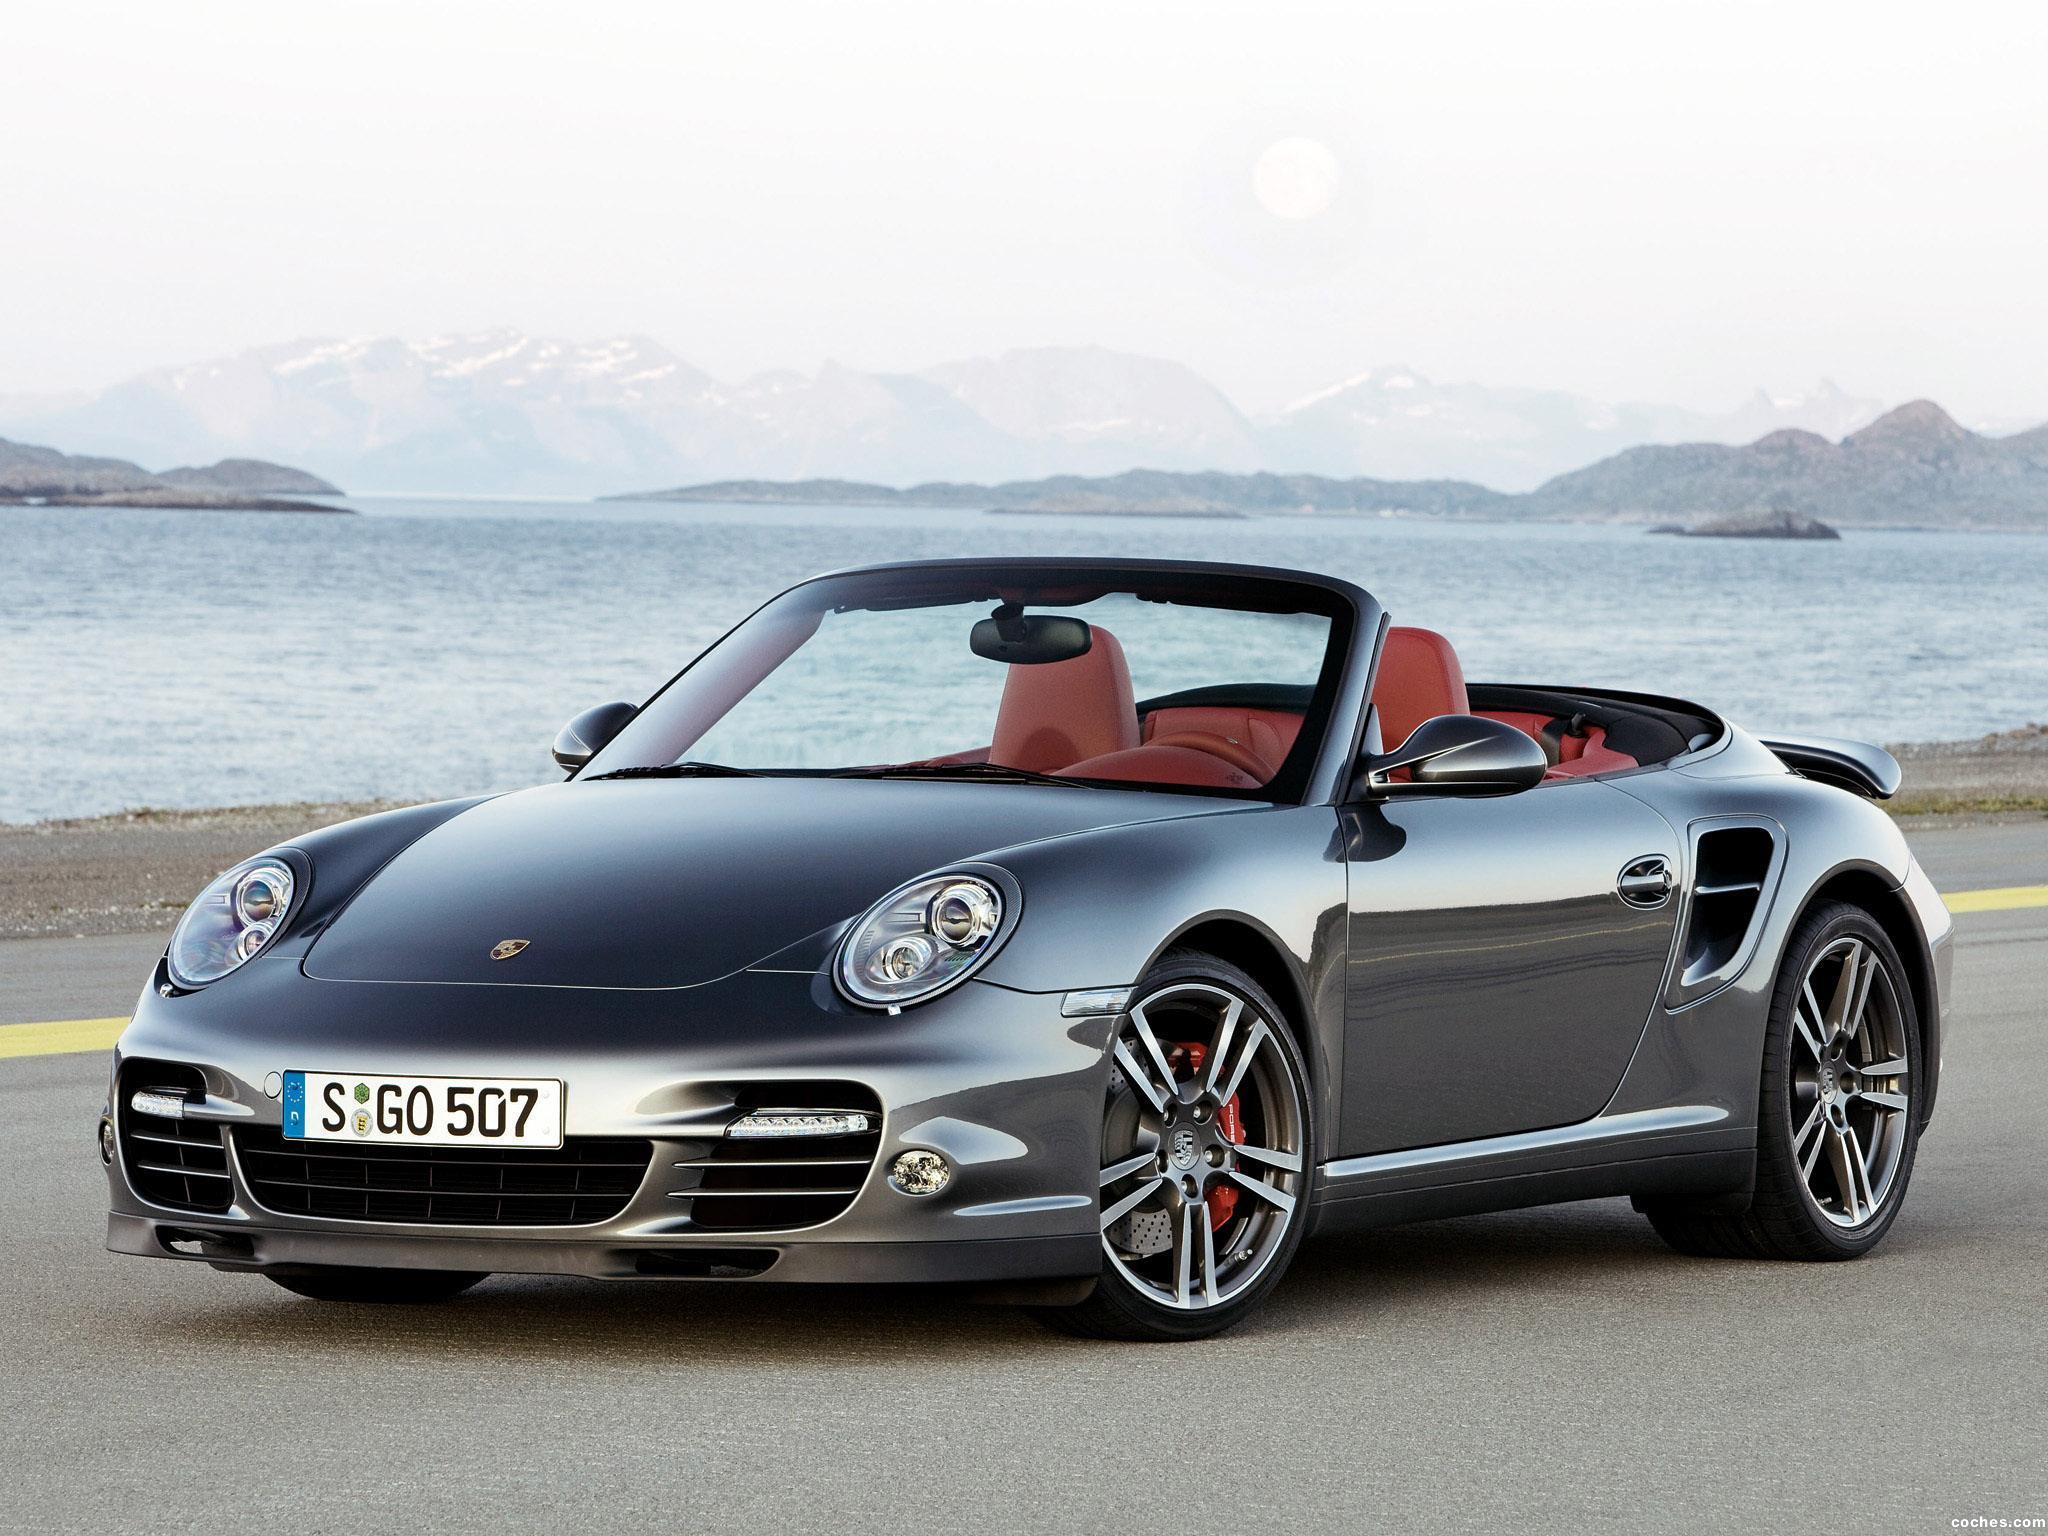 Fotos De Porsche 911 Turbo Cabriolet 997 2009